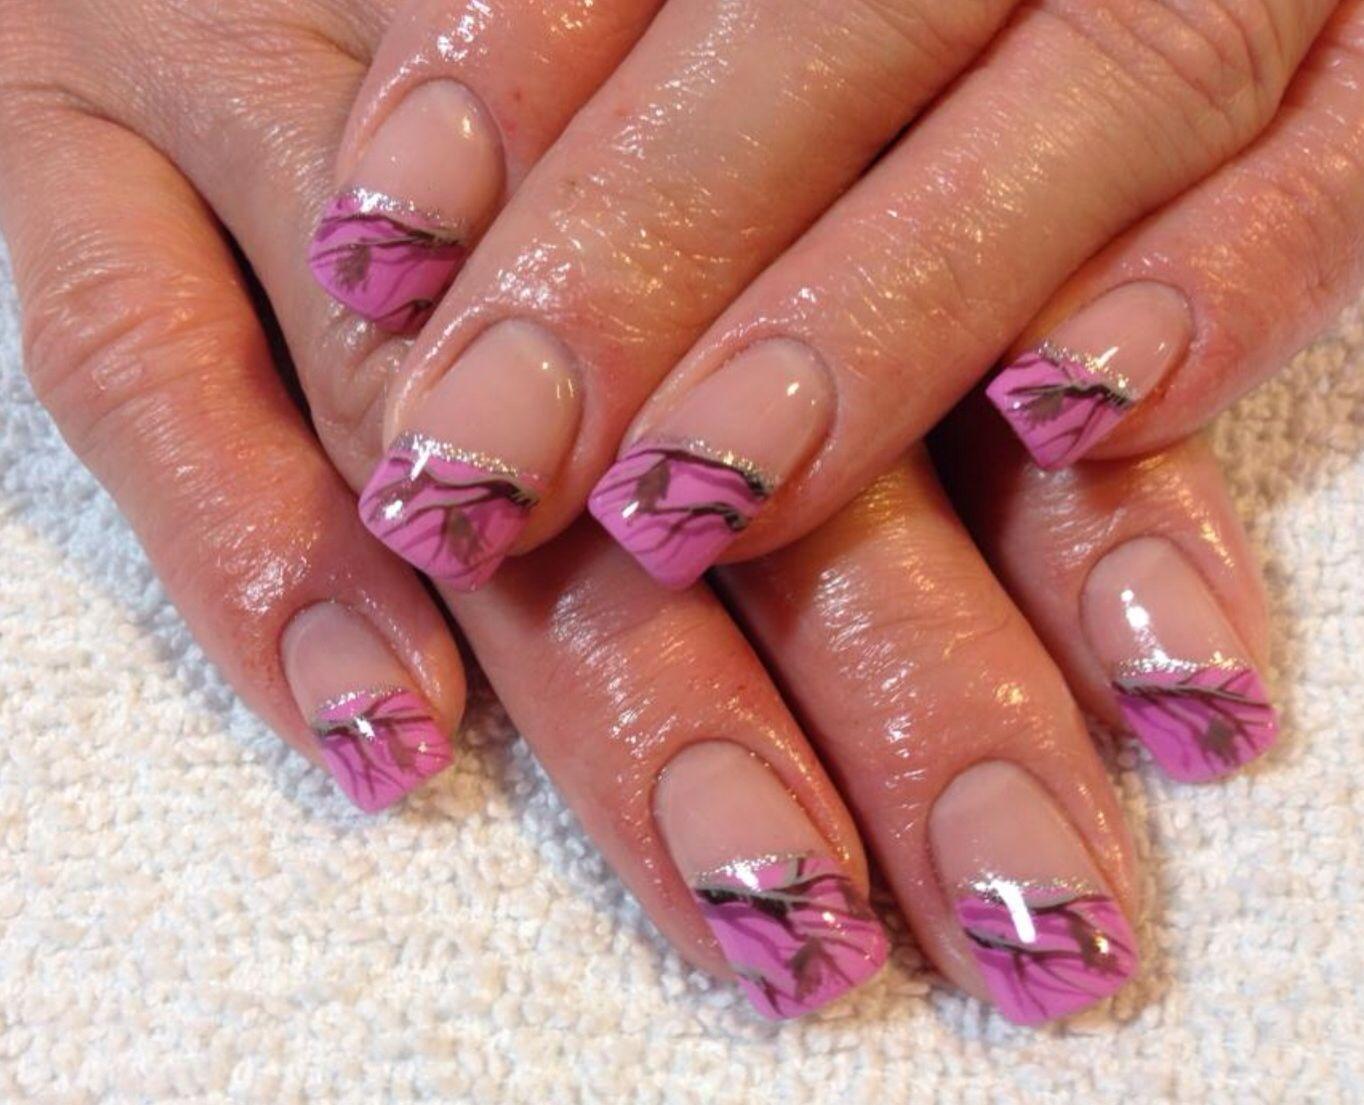 Realtree camo nails | My Style | Pinterest | Camo nails, Camo and ...